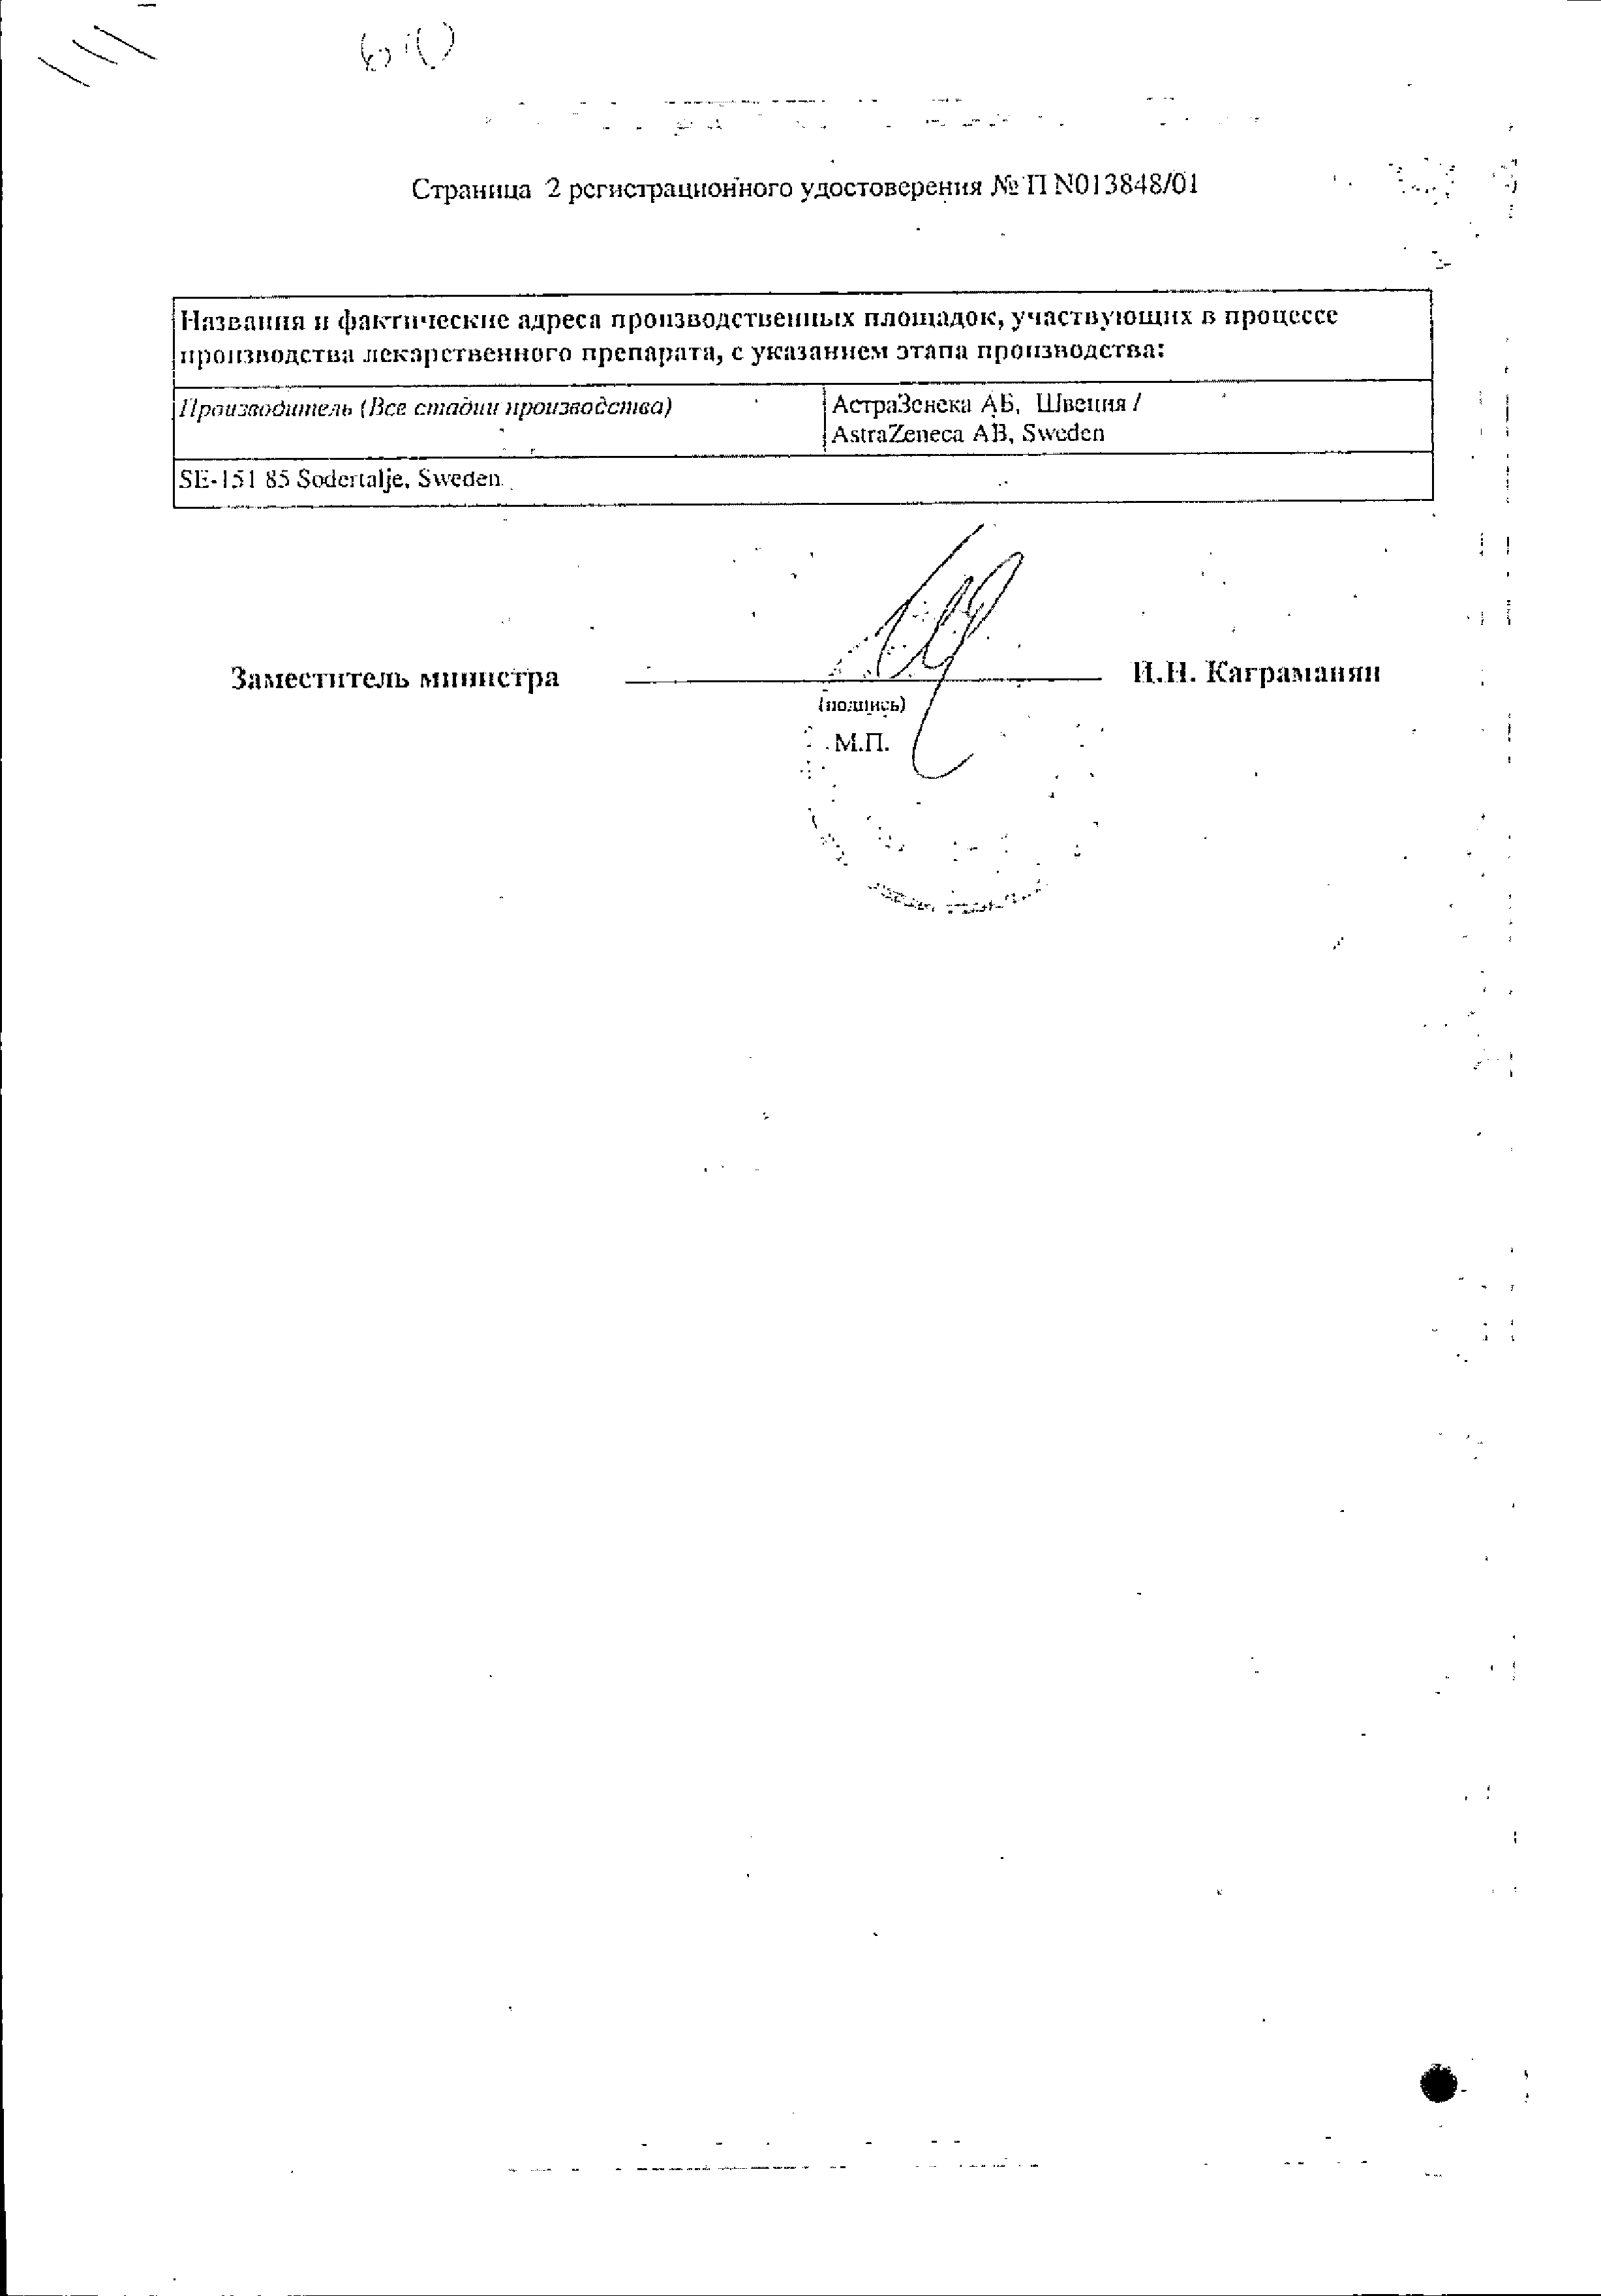 Лосек МАПС сертификат